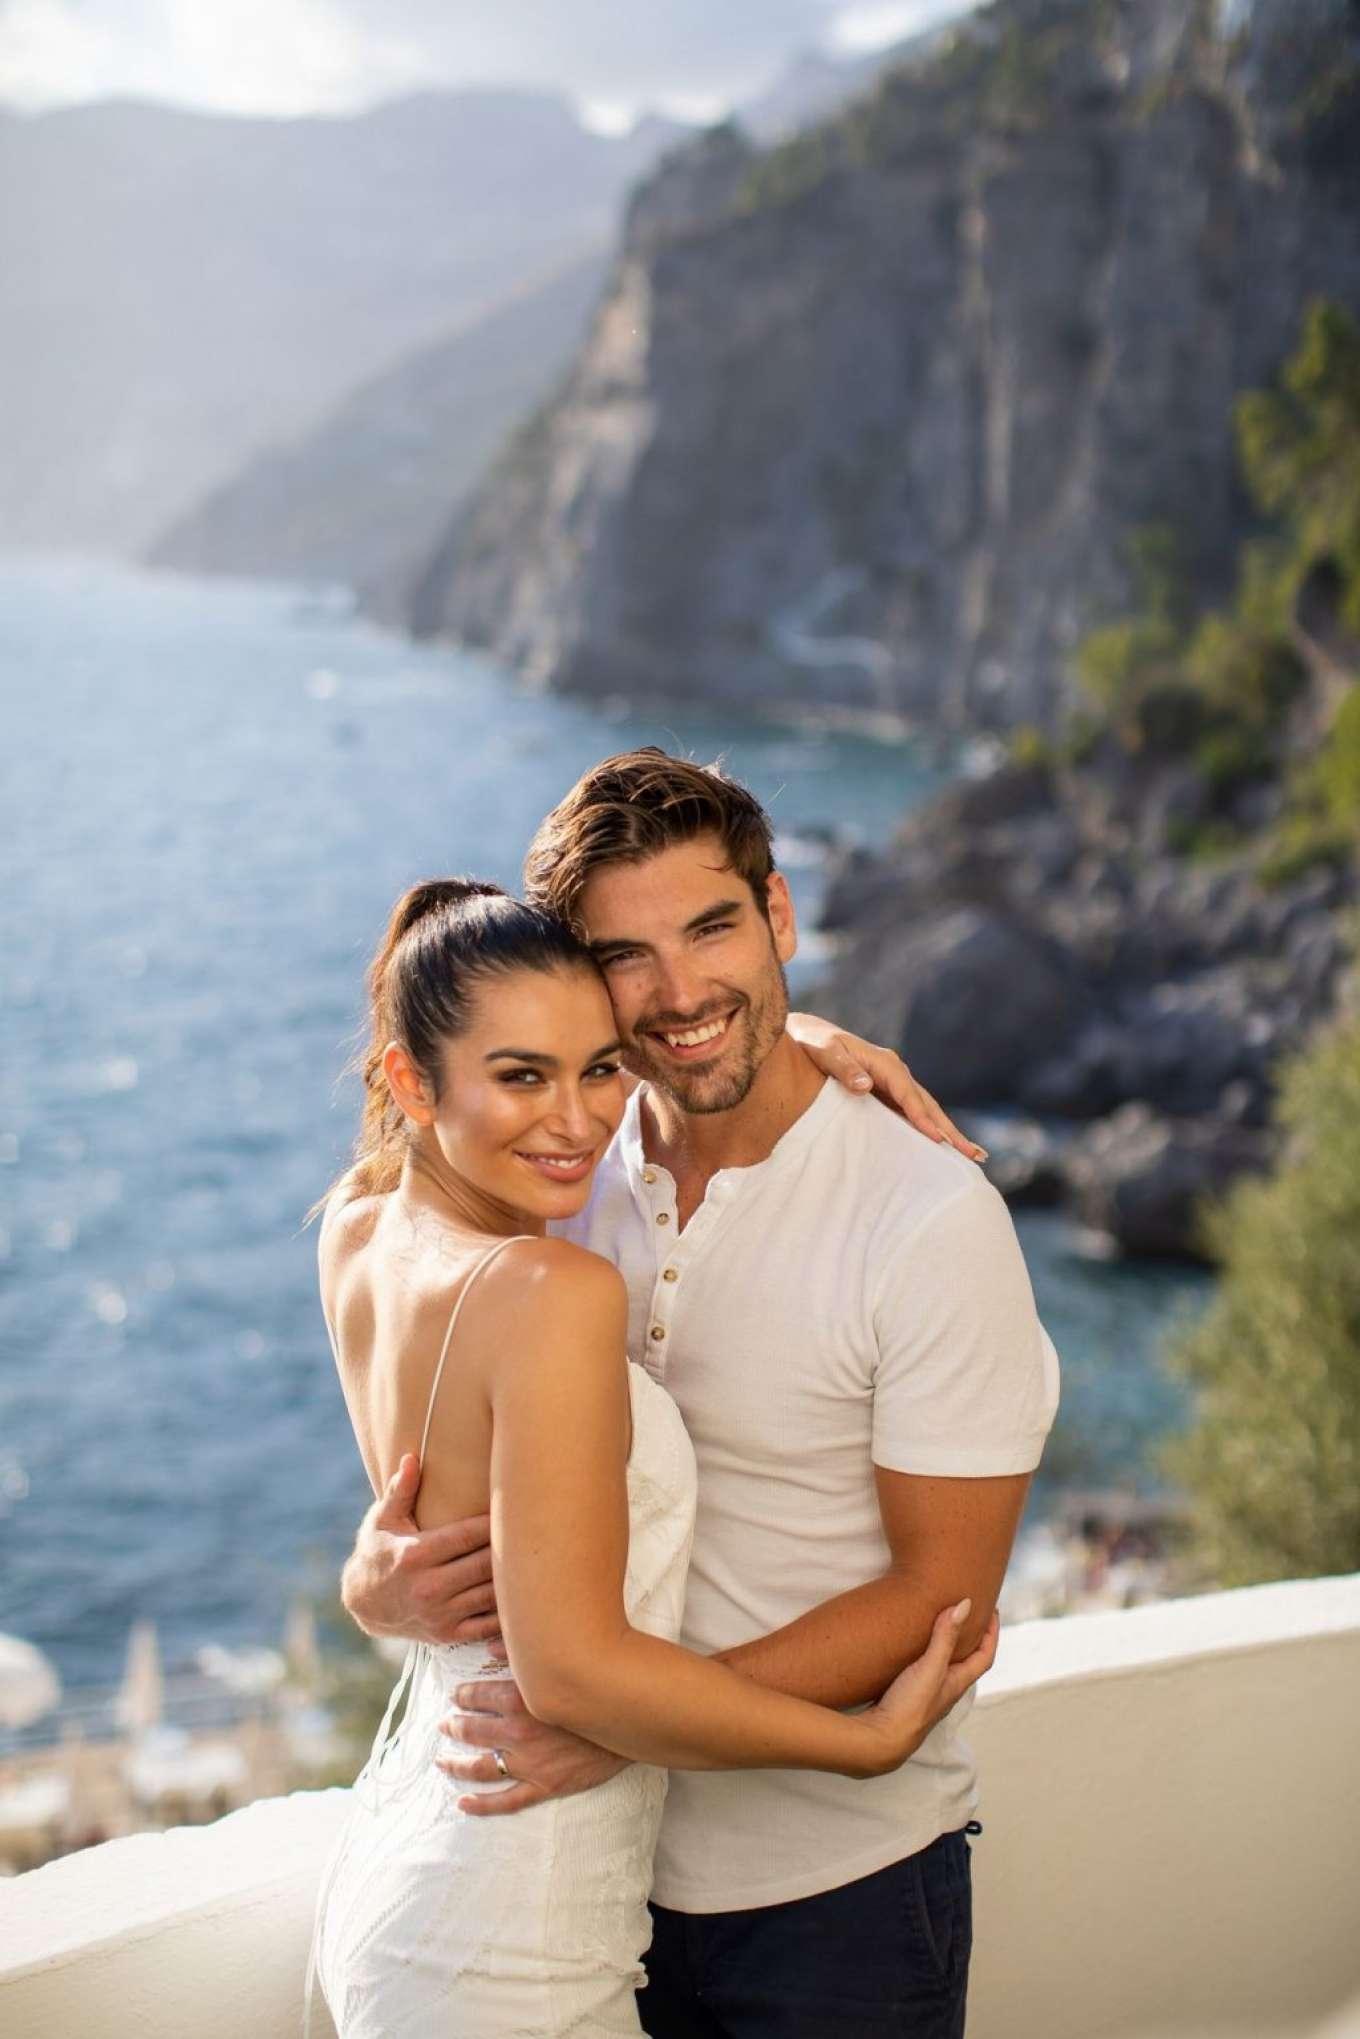 Ashley Iaconetti 2019 : Ashley Iaconetti and Jared Haibon on their honeymoon-05